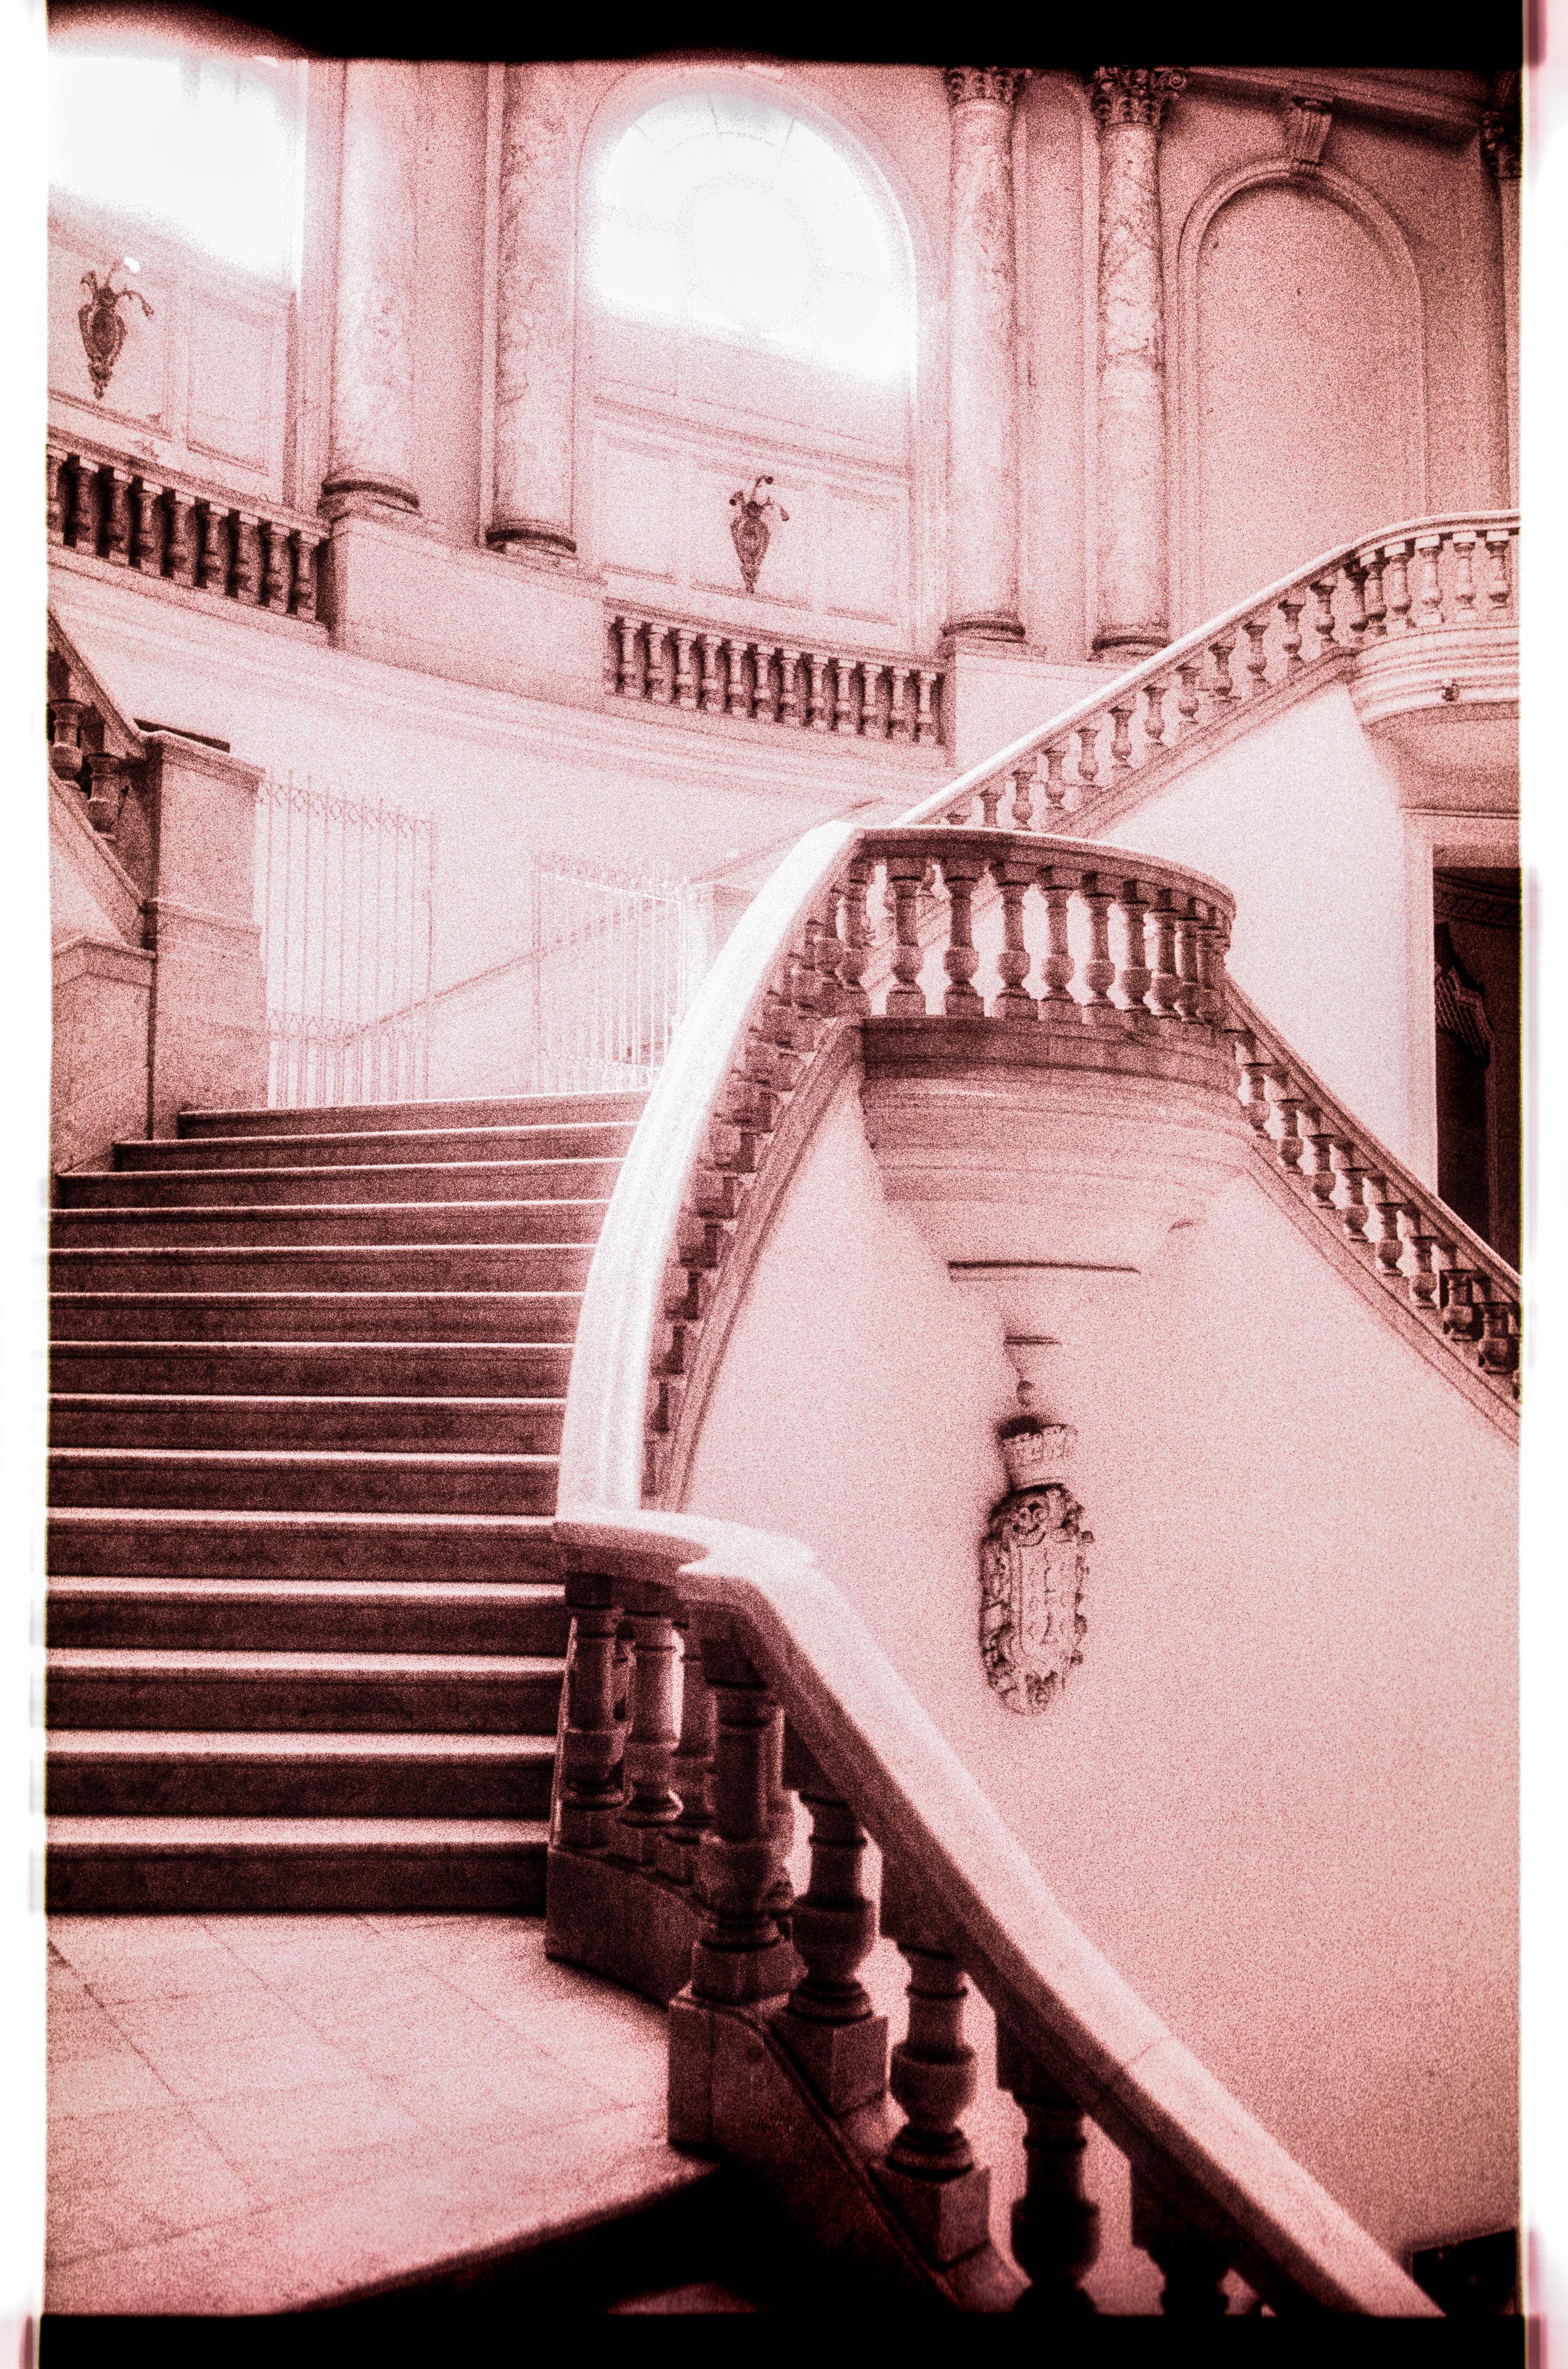 Siesta_Cuba-05.jpg